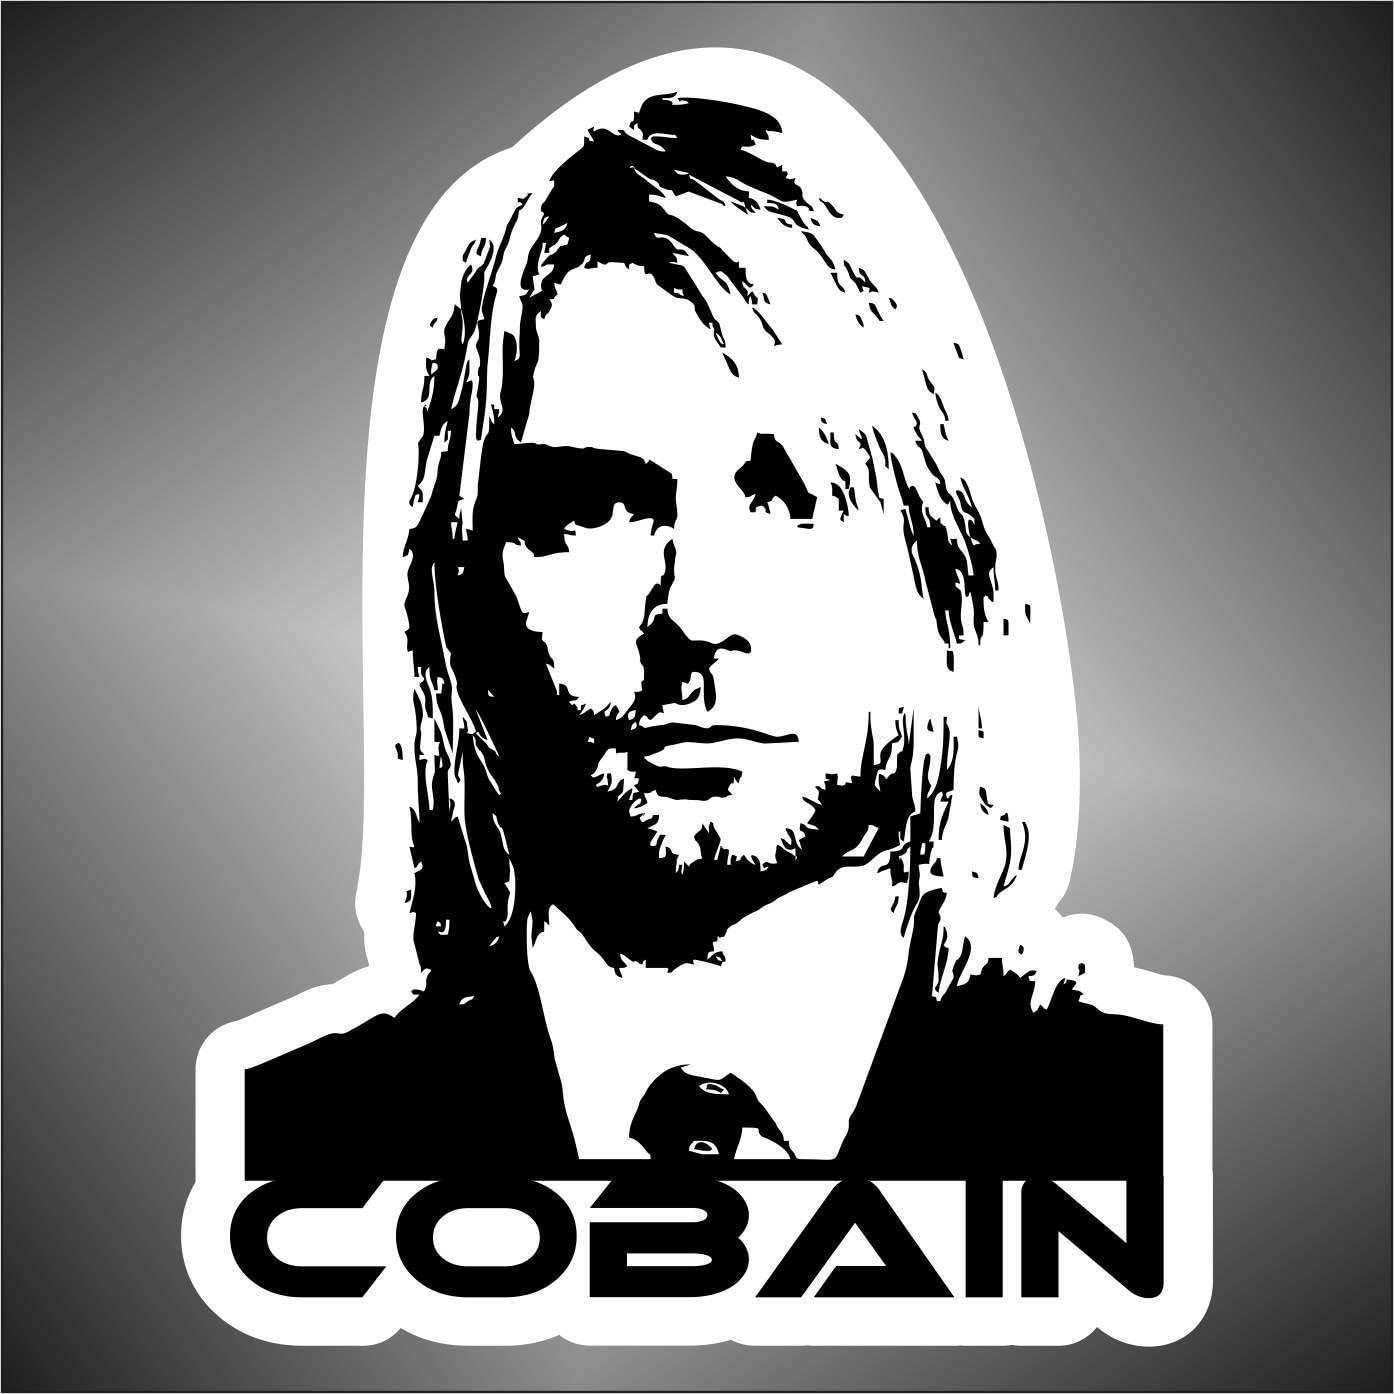 Nirvana Kurt Cobain Sticker Sticker Hip Hop Music Rap Jazz Hard Rock Pop Funk Sticker 30 Cm Küche Haushalt